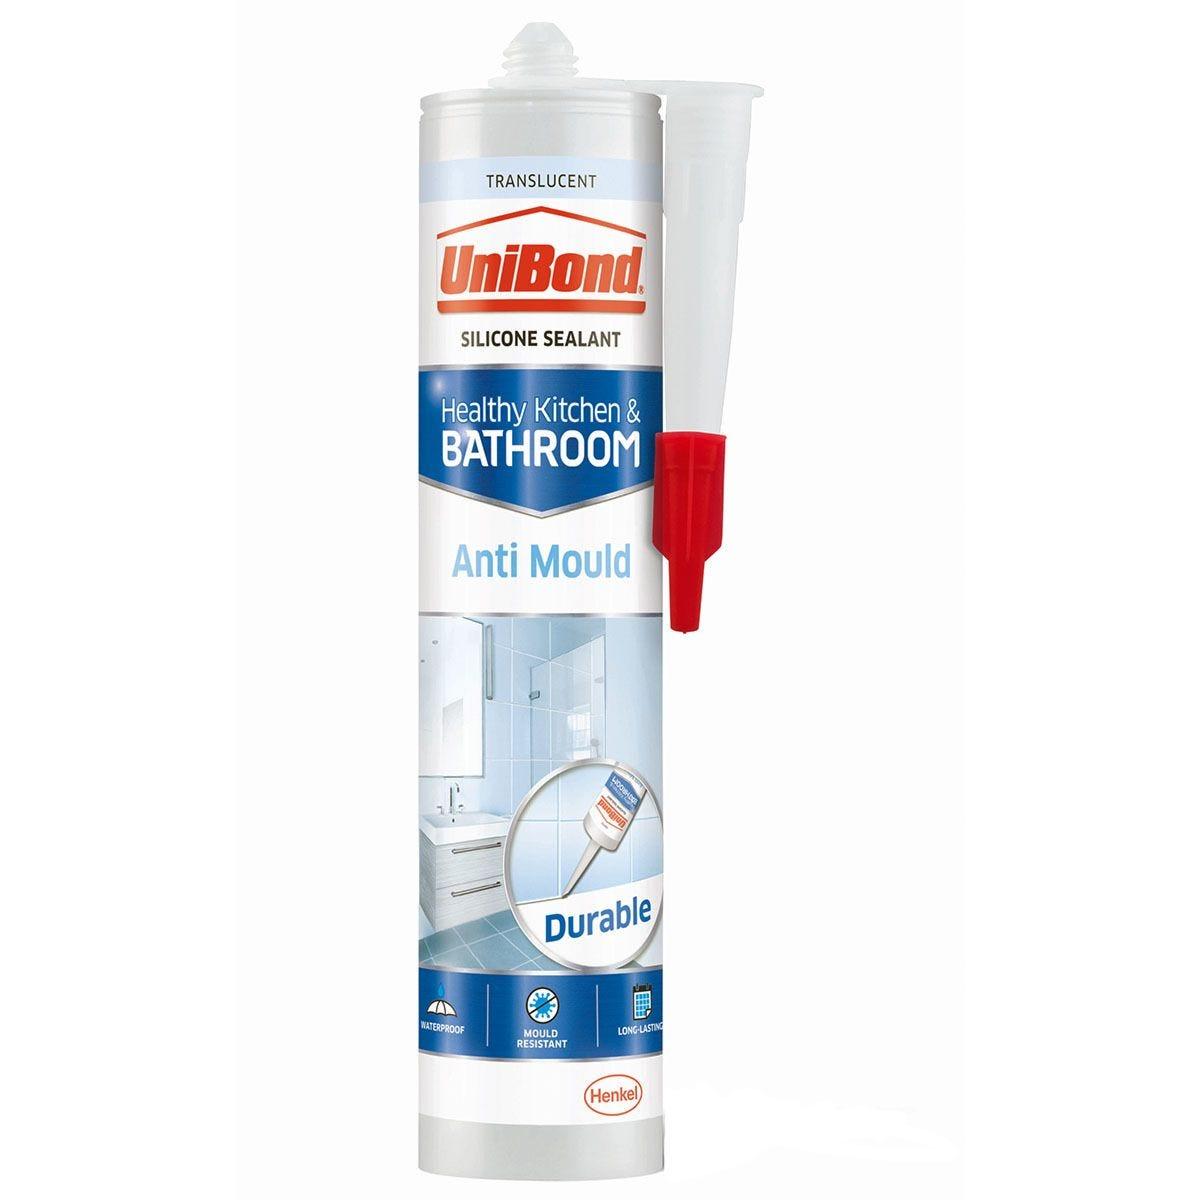 UniBond Anti Mould Kitchen and Bathroom Sealant - Translucent